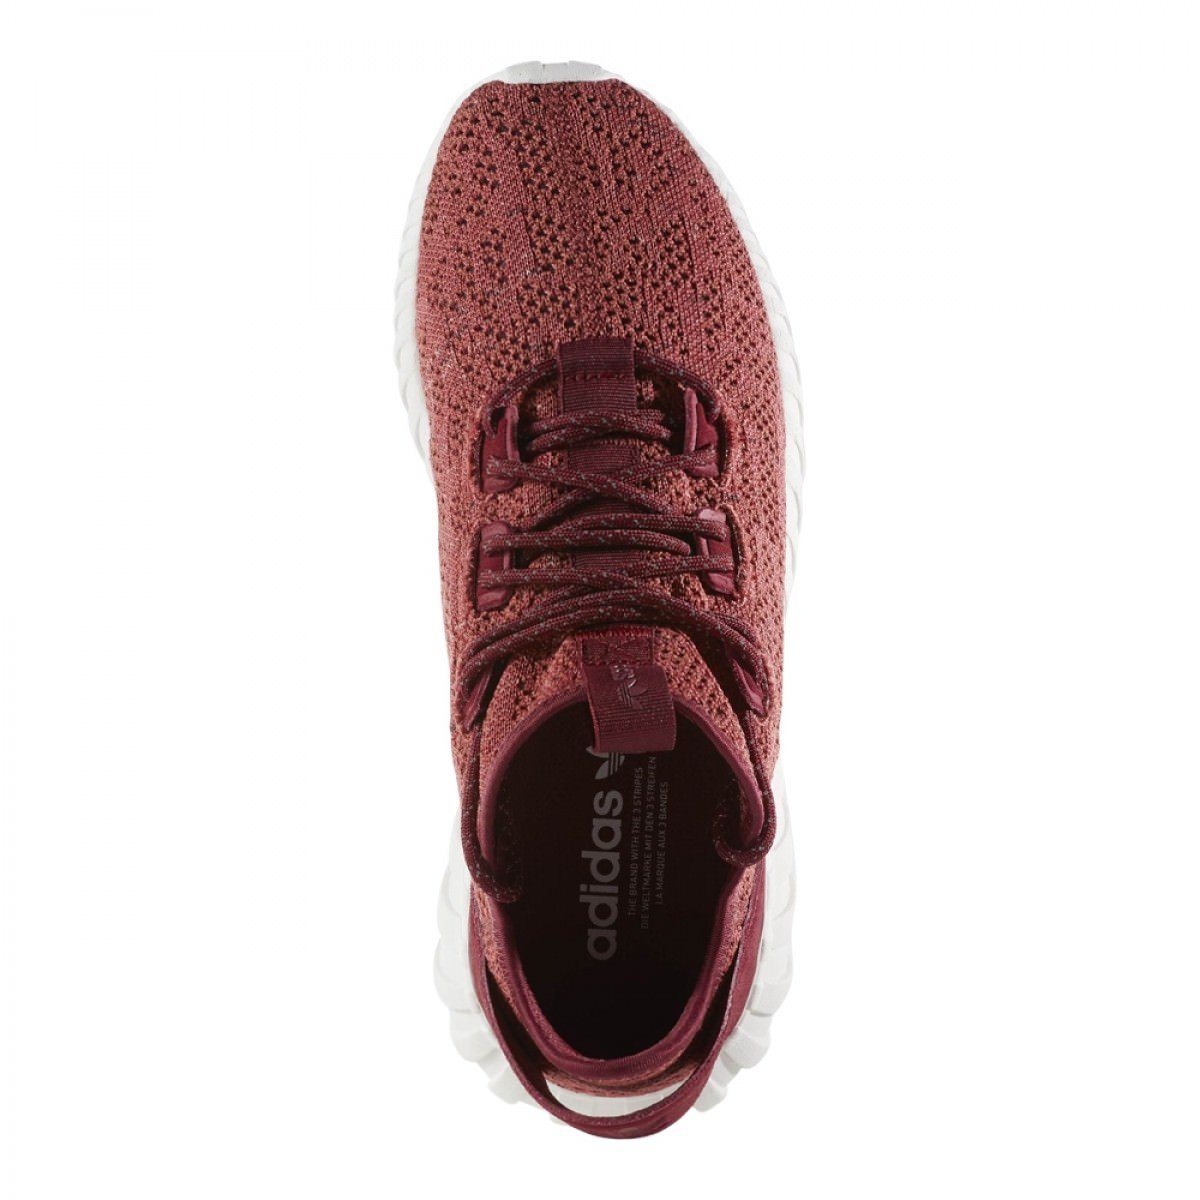 a585bf3e1274 adidas Men Tubular Doom Sock Primeknit red Mystery red Collegiate Burgundy  Crystal White Size 4.5 US